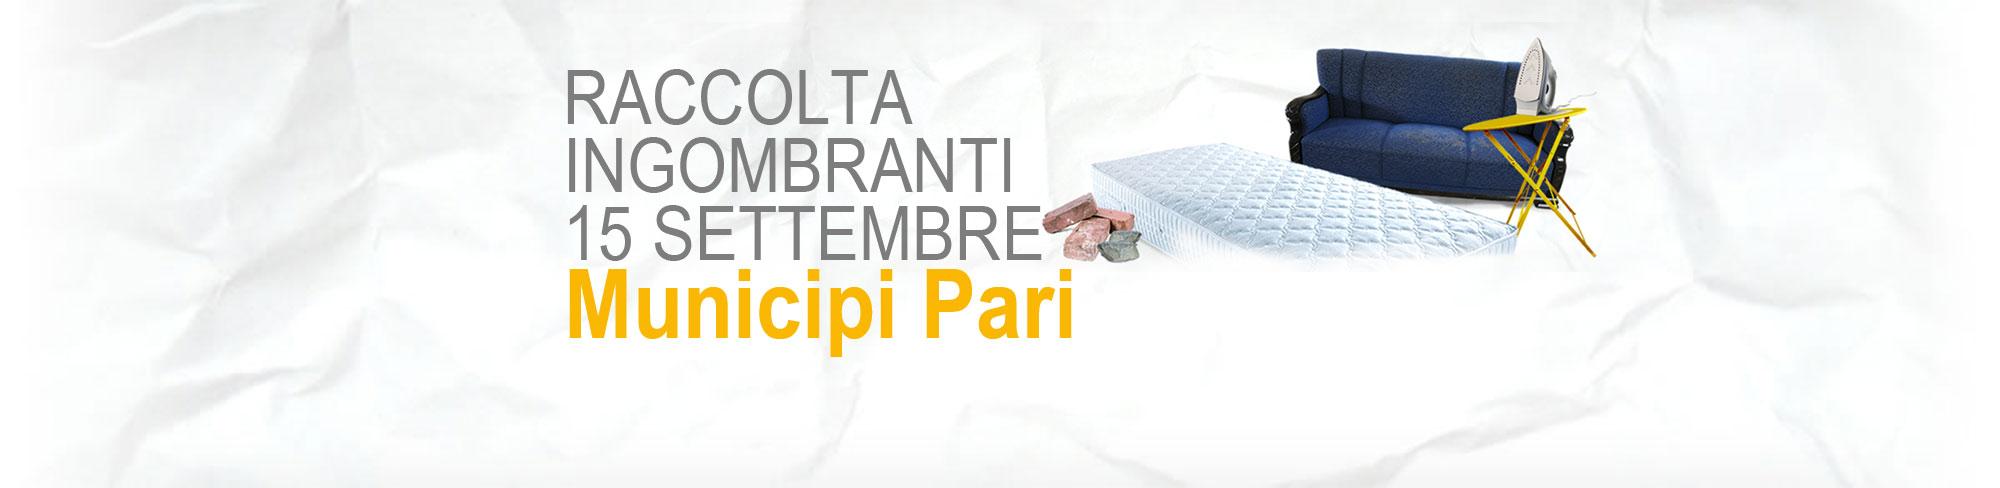 Raccolta Rifiuti Ingombranti Roma Calendario 2020 Municipi Dispari.Raccolta Differenziata